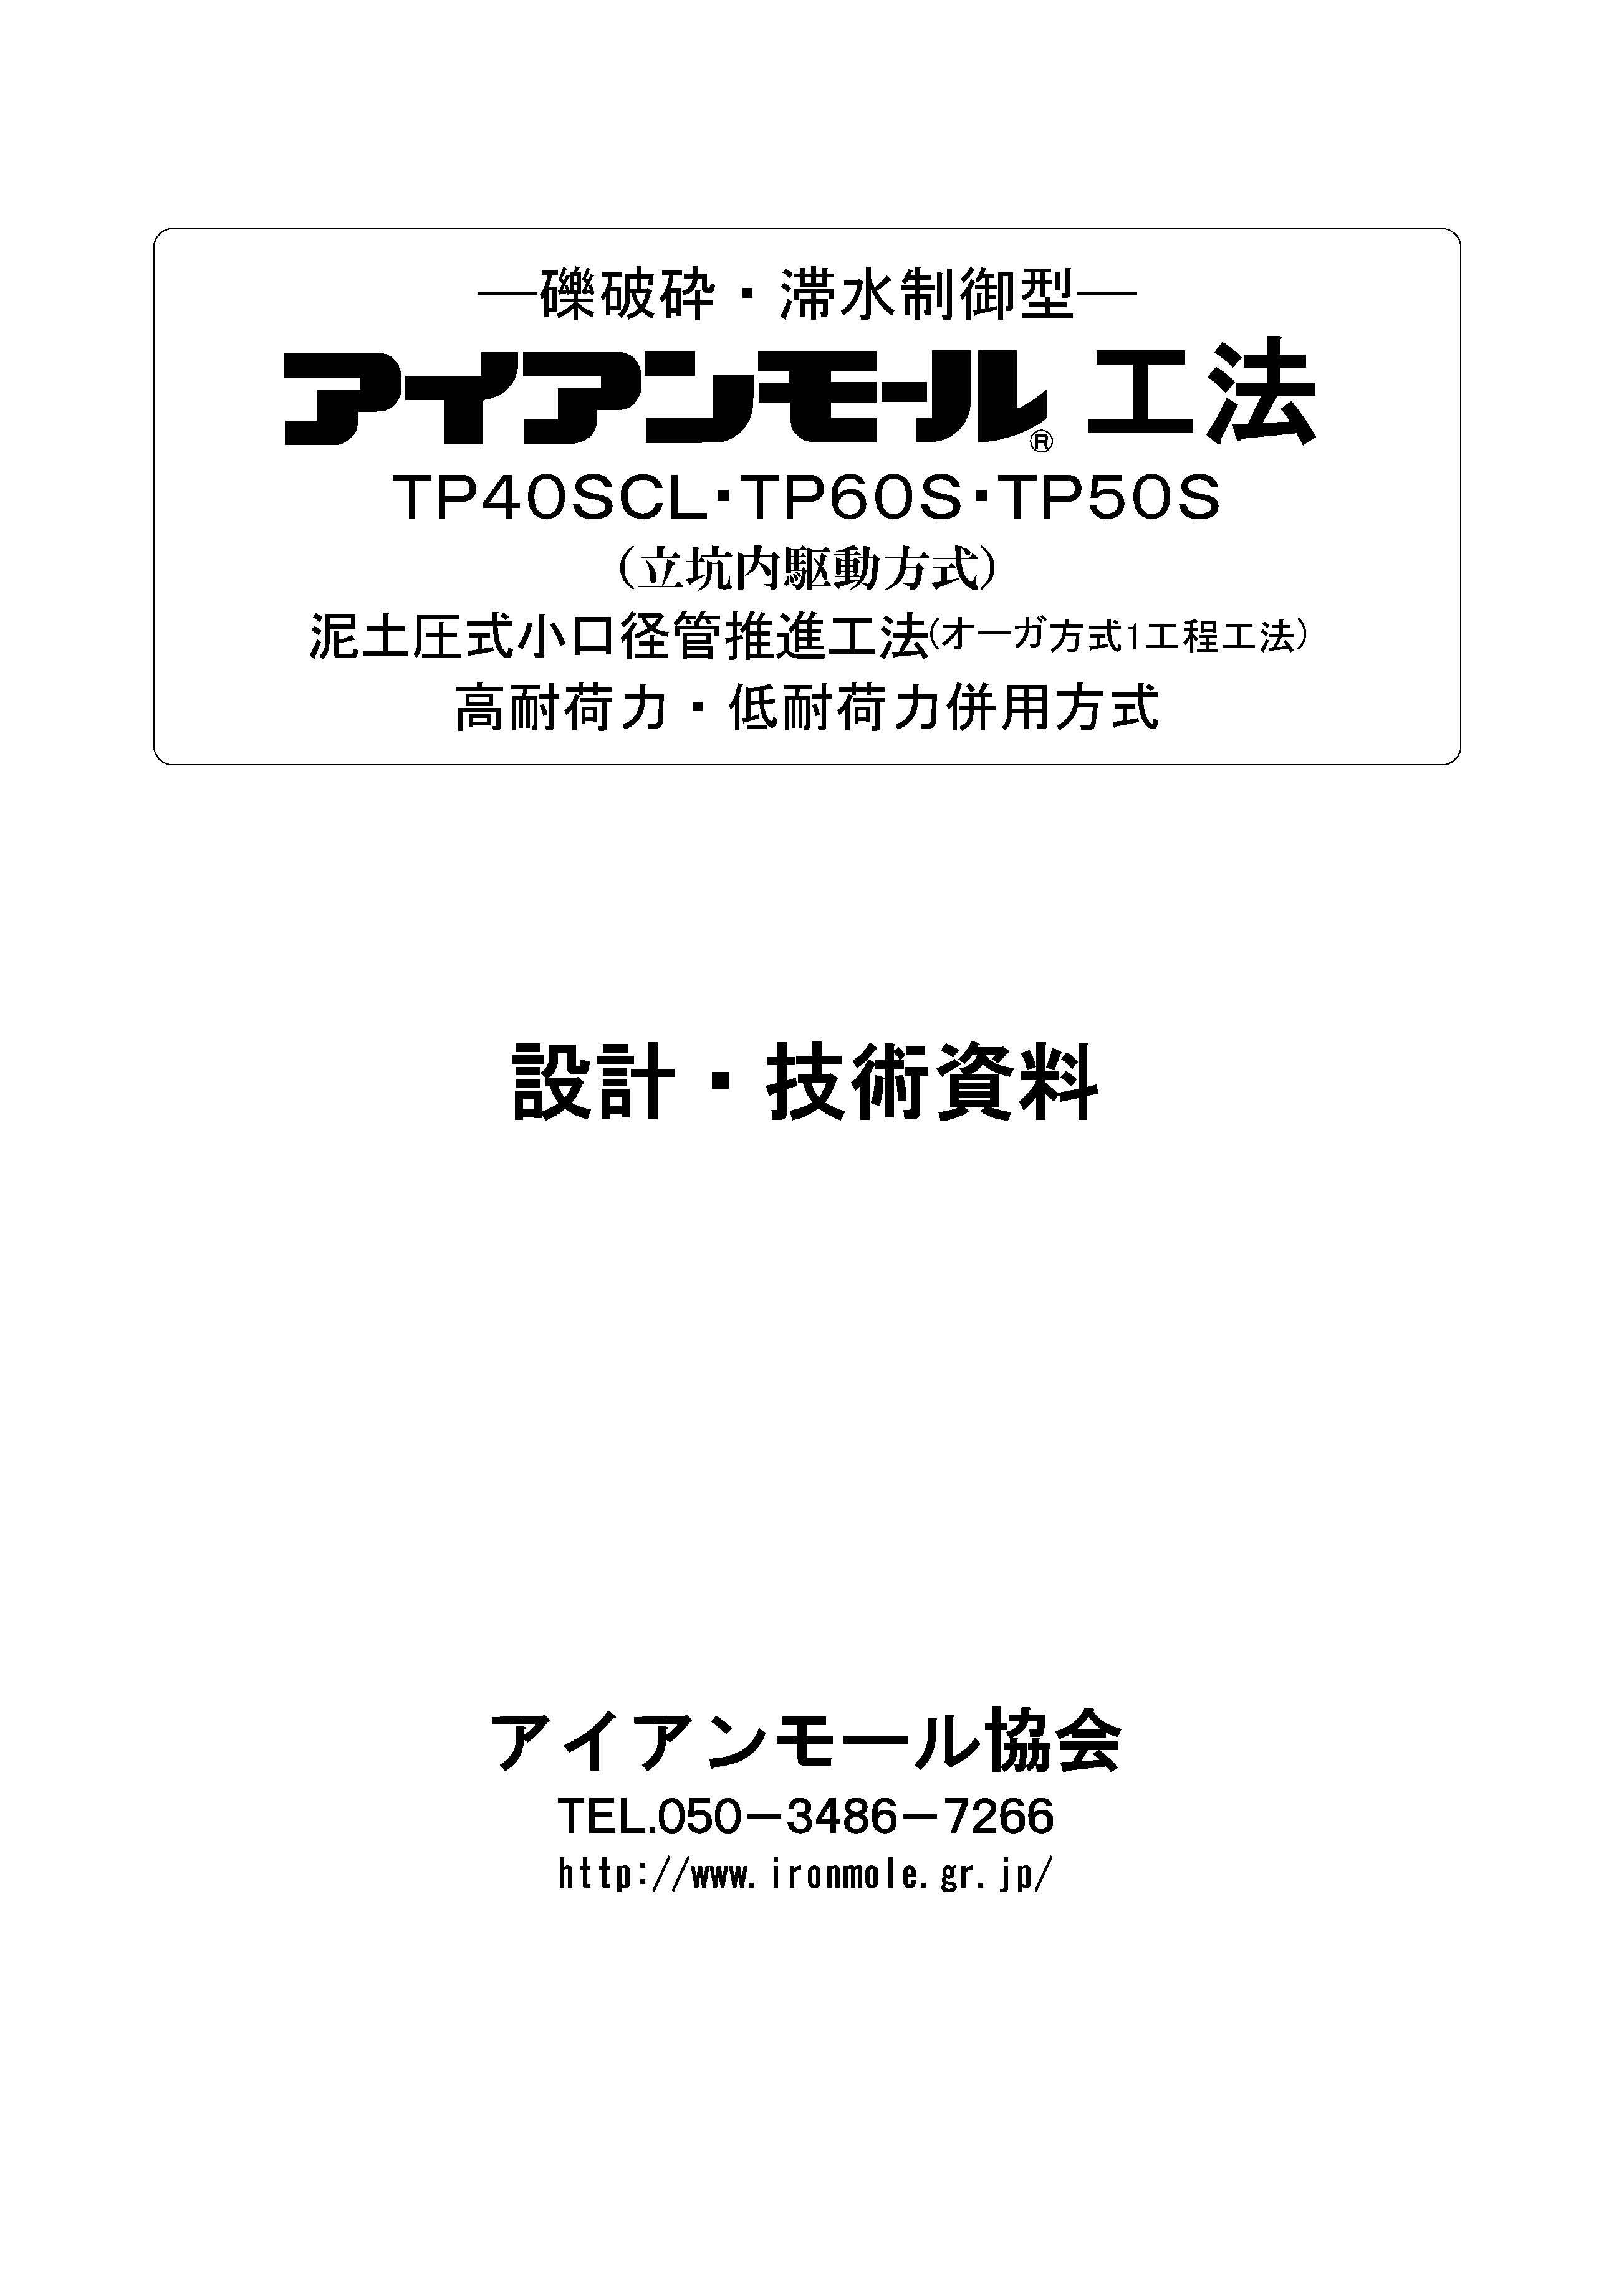 H31アイアンモール工法_TP40SCL・TP60S・TP50S_設計・技術資料 1